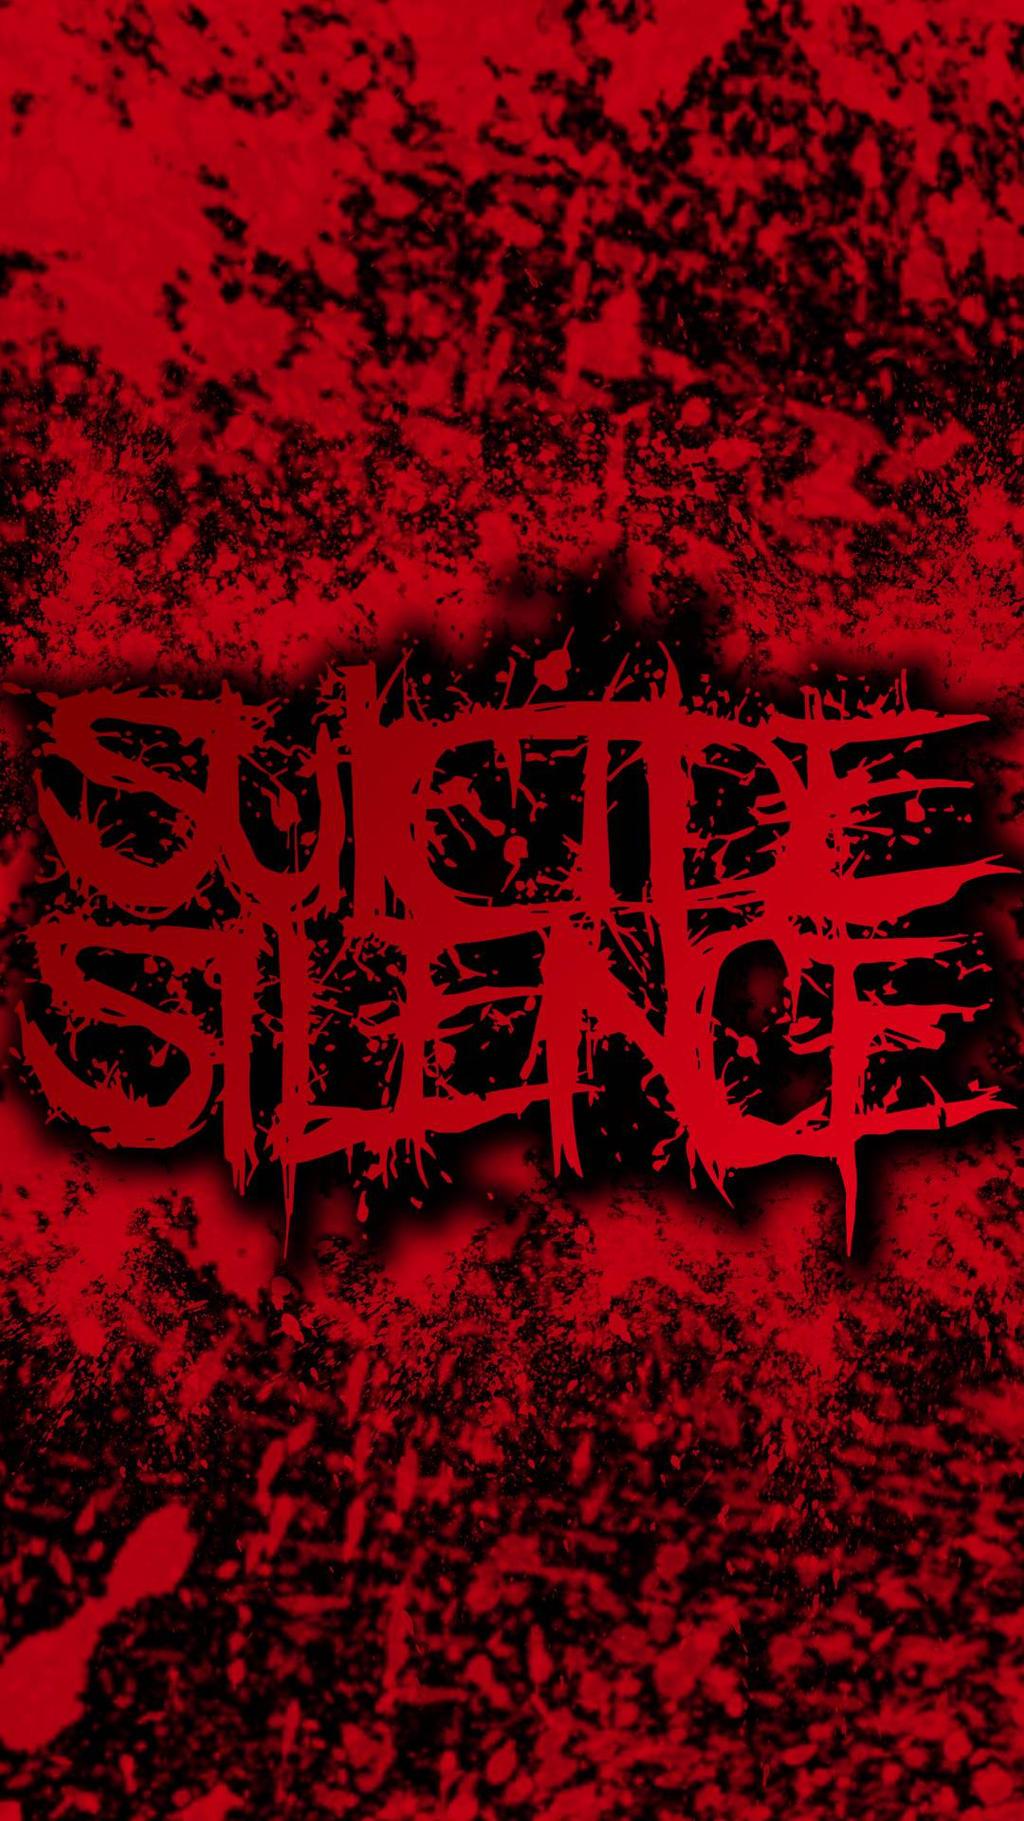 Suicide Silence Mobile Wallpaper By Whytfyoutalkinshit On